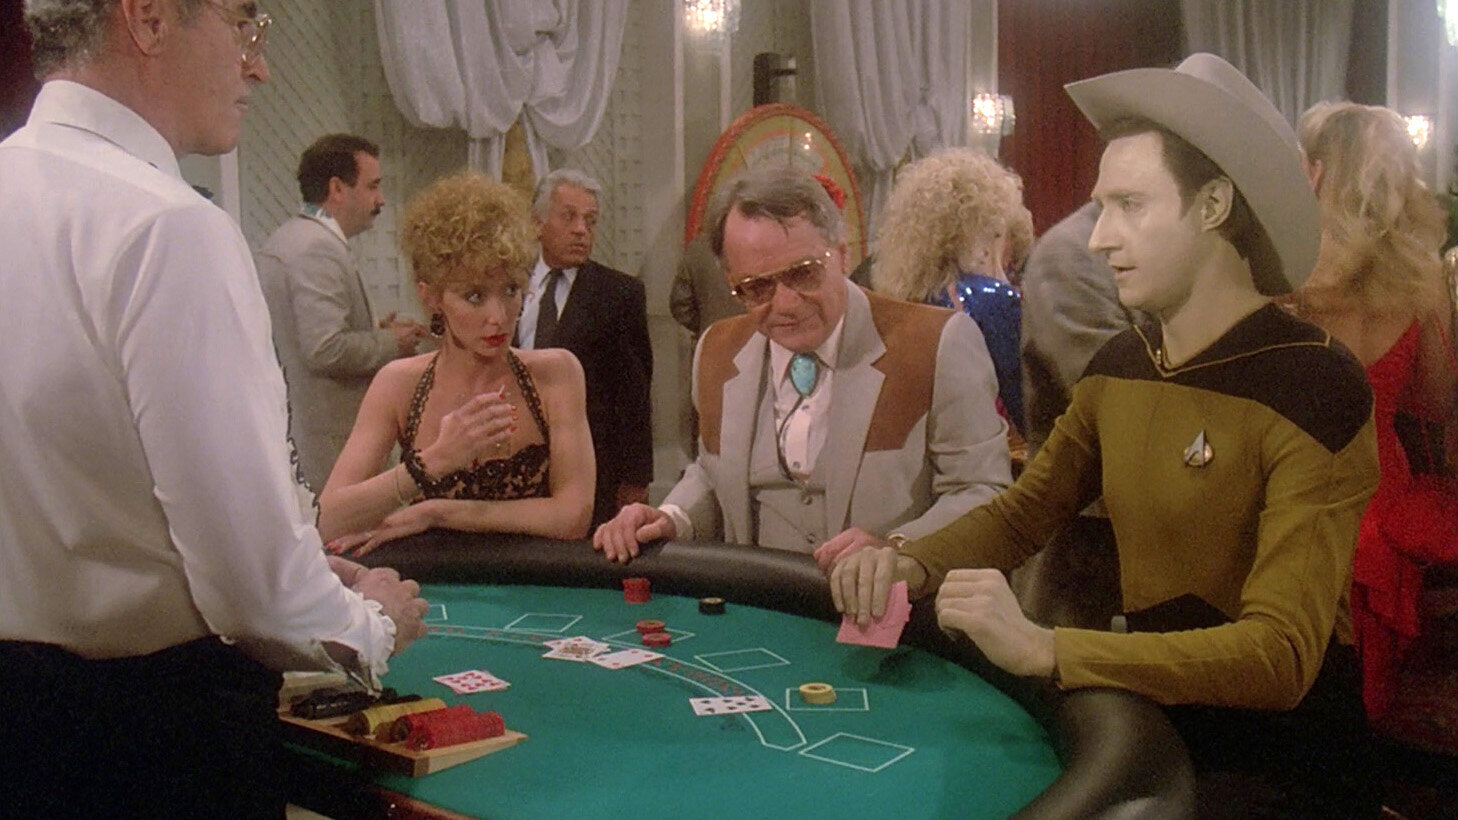 Casino royale star trek casino job youtube